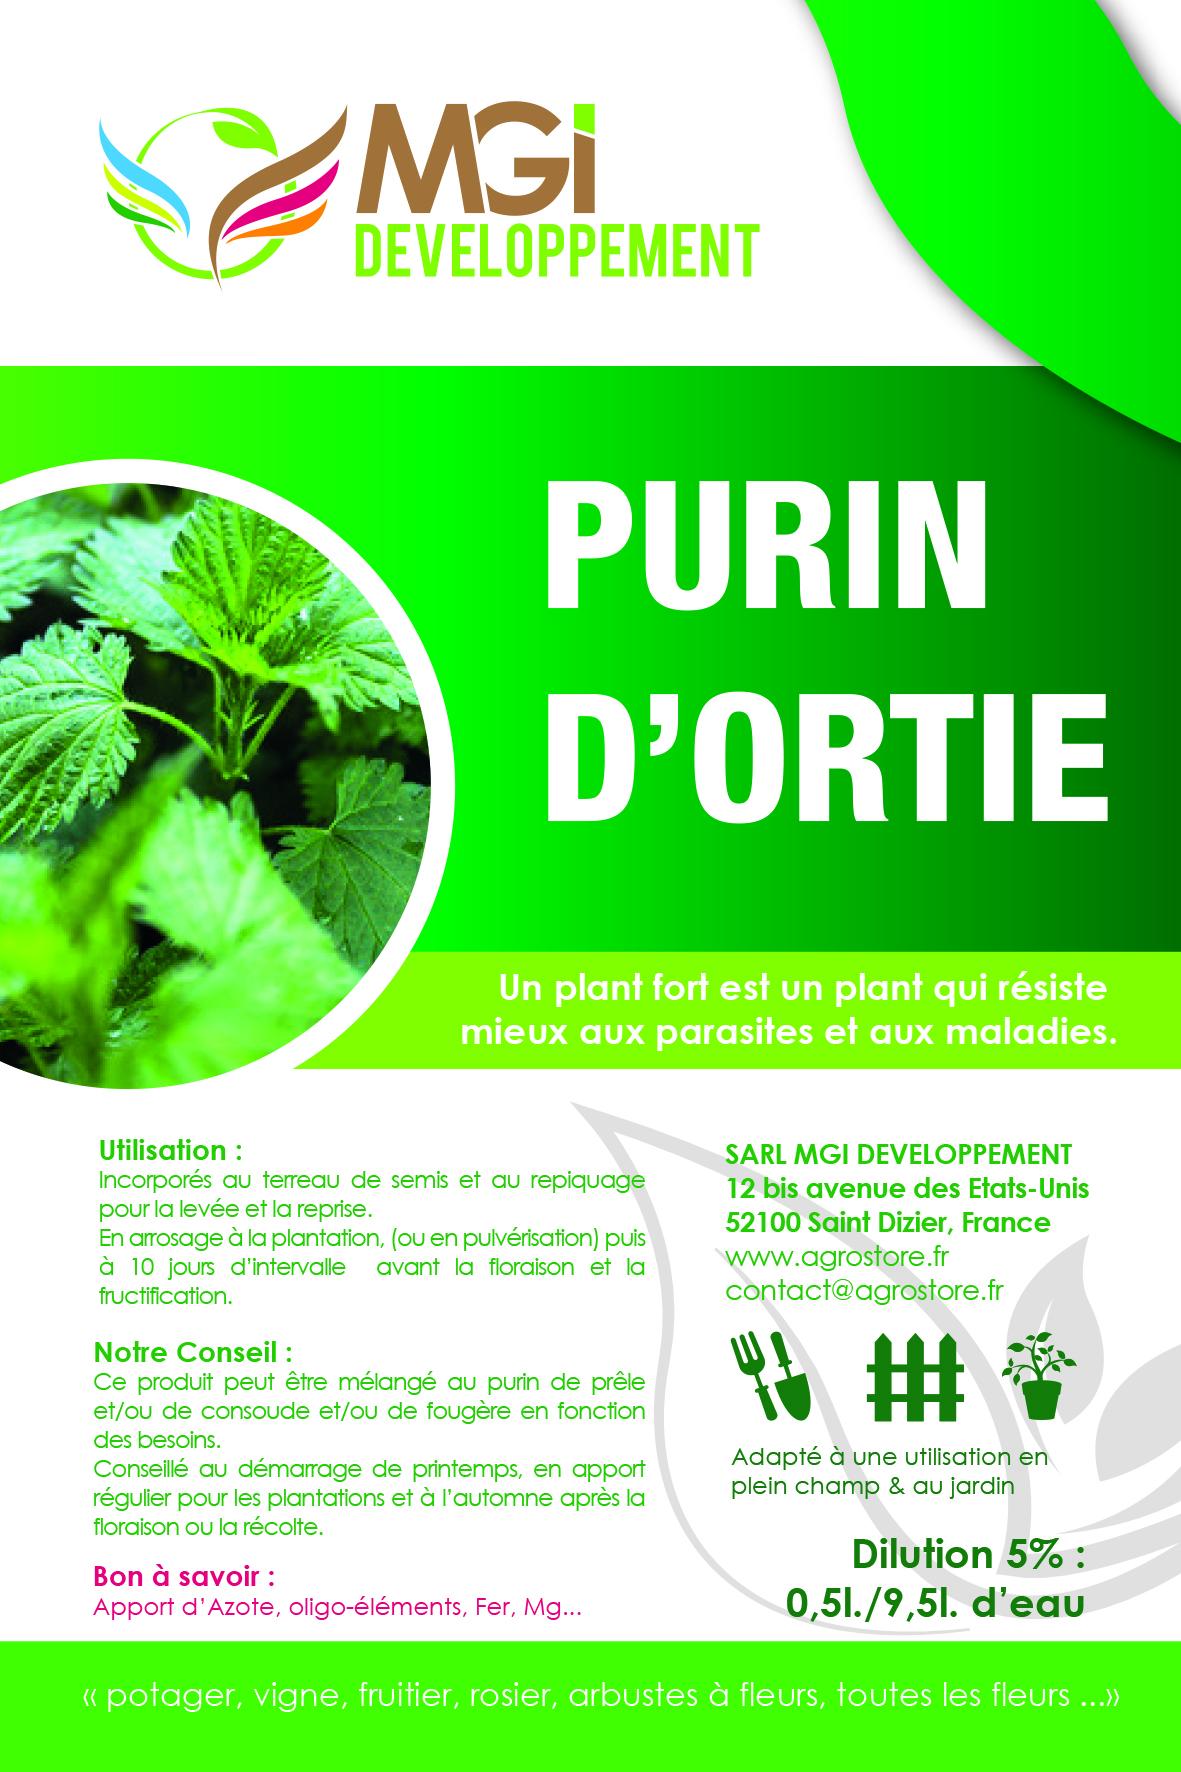 Utilisation du purin d ortie - Utilisation du purin d ortie ...